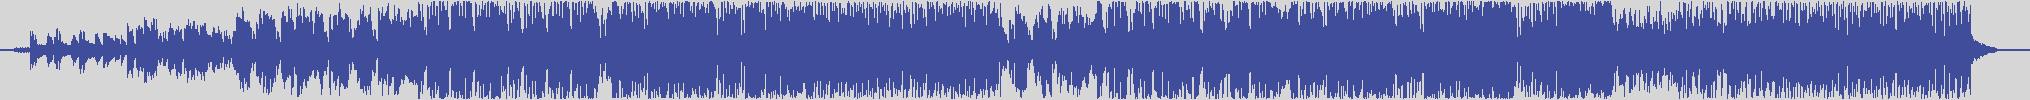 gold_hit_records [GHR003] Lucas Castro - Sigue Sigue [Radio Edit] audio wave form